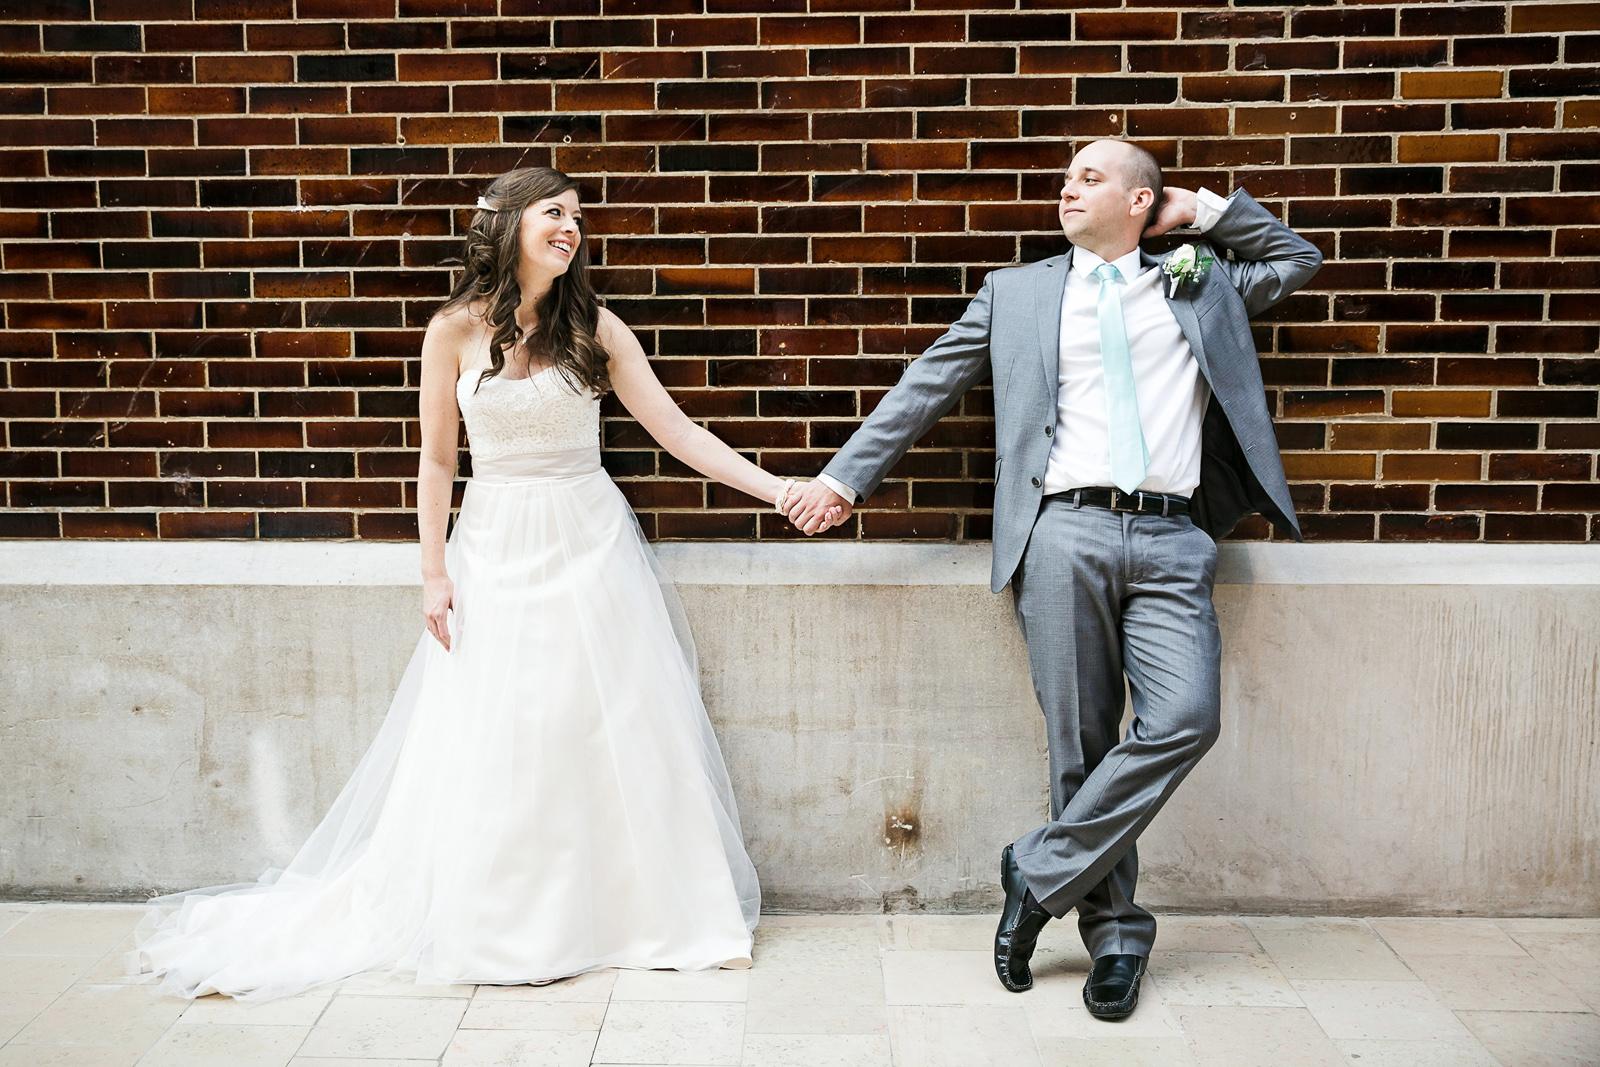 Oldani-Photography-St-Louis-Union-Station-Wedding-Party-wedding-photos_20140927_16135422.jpg